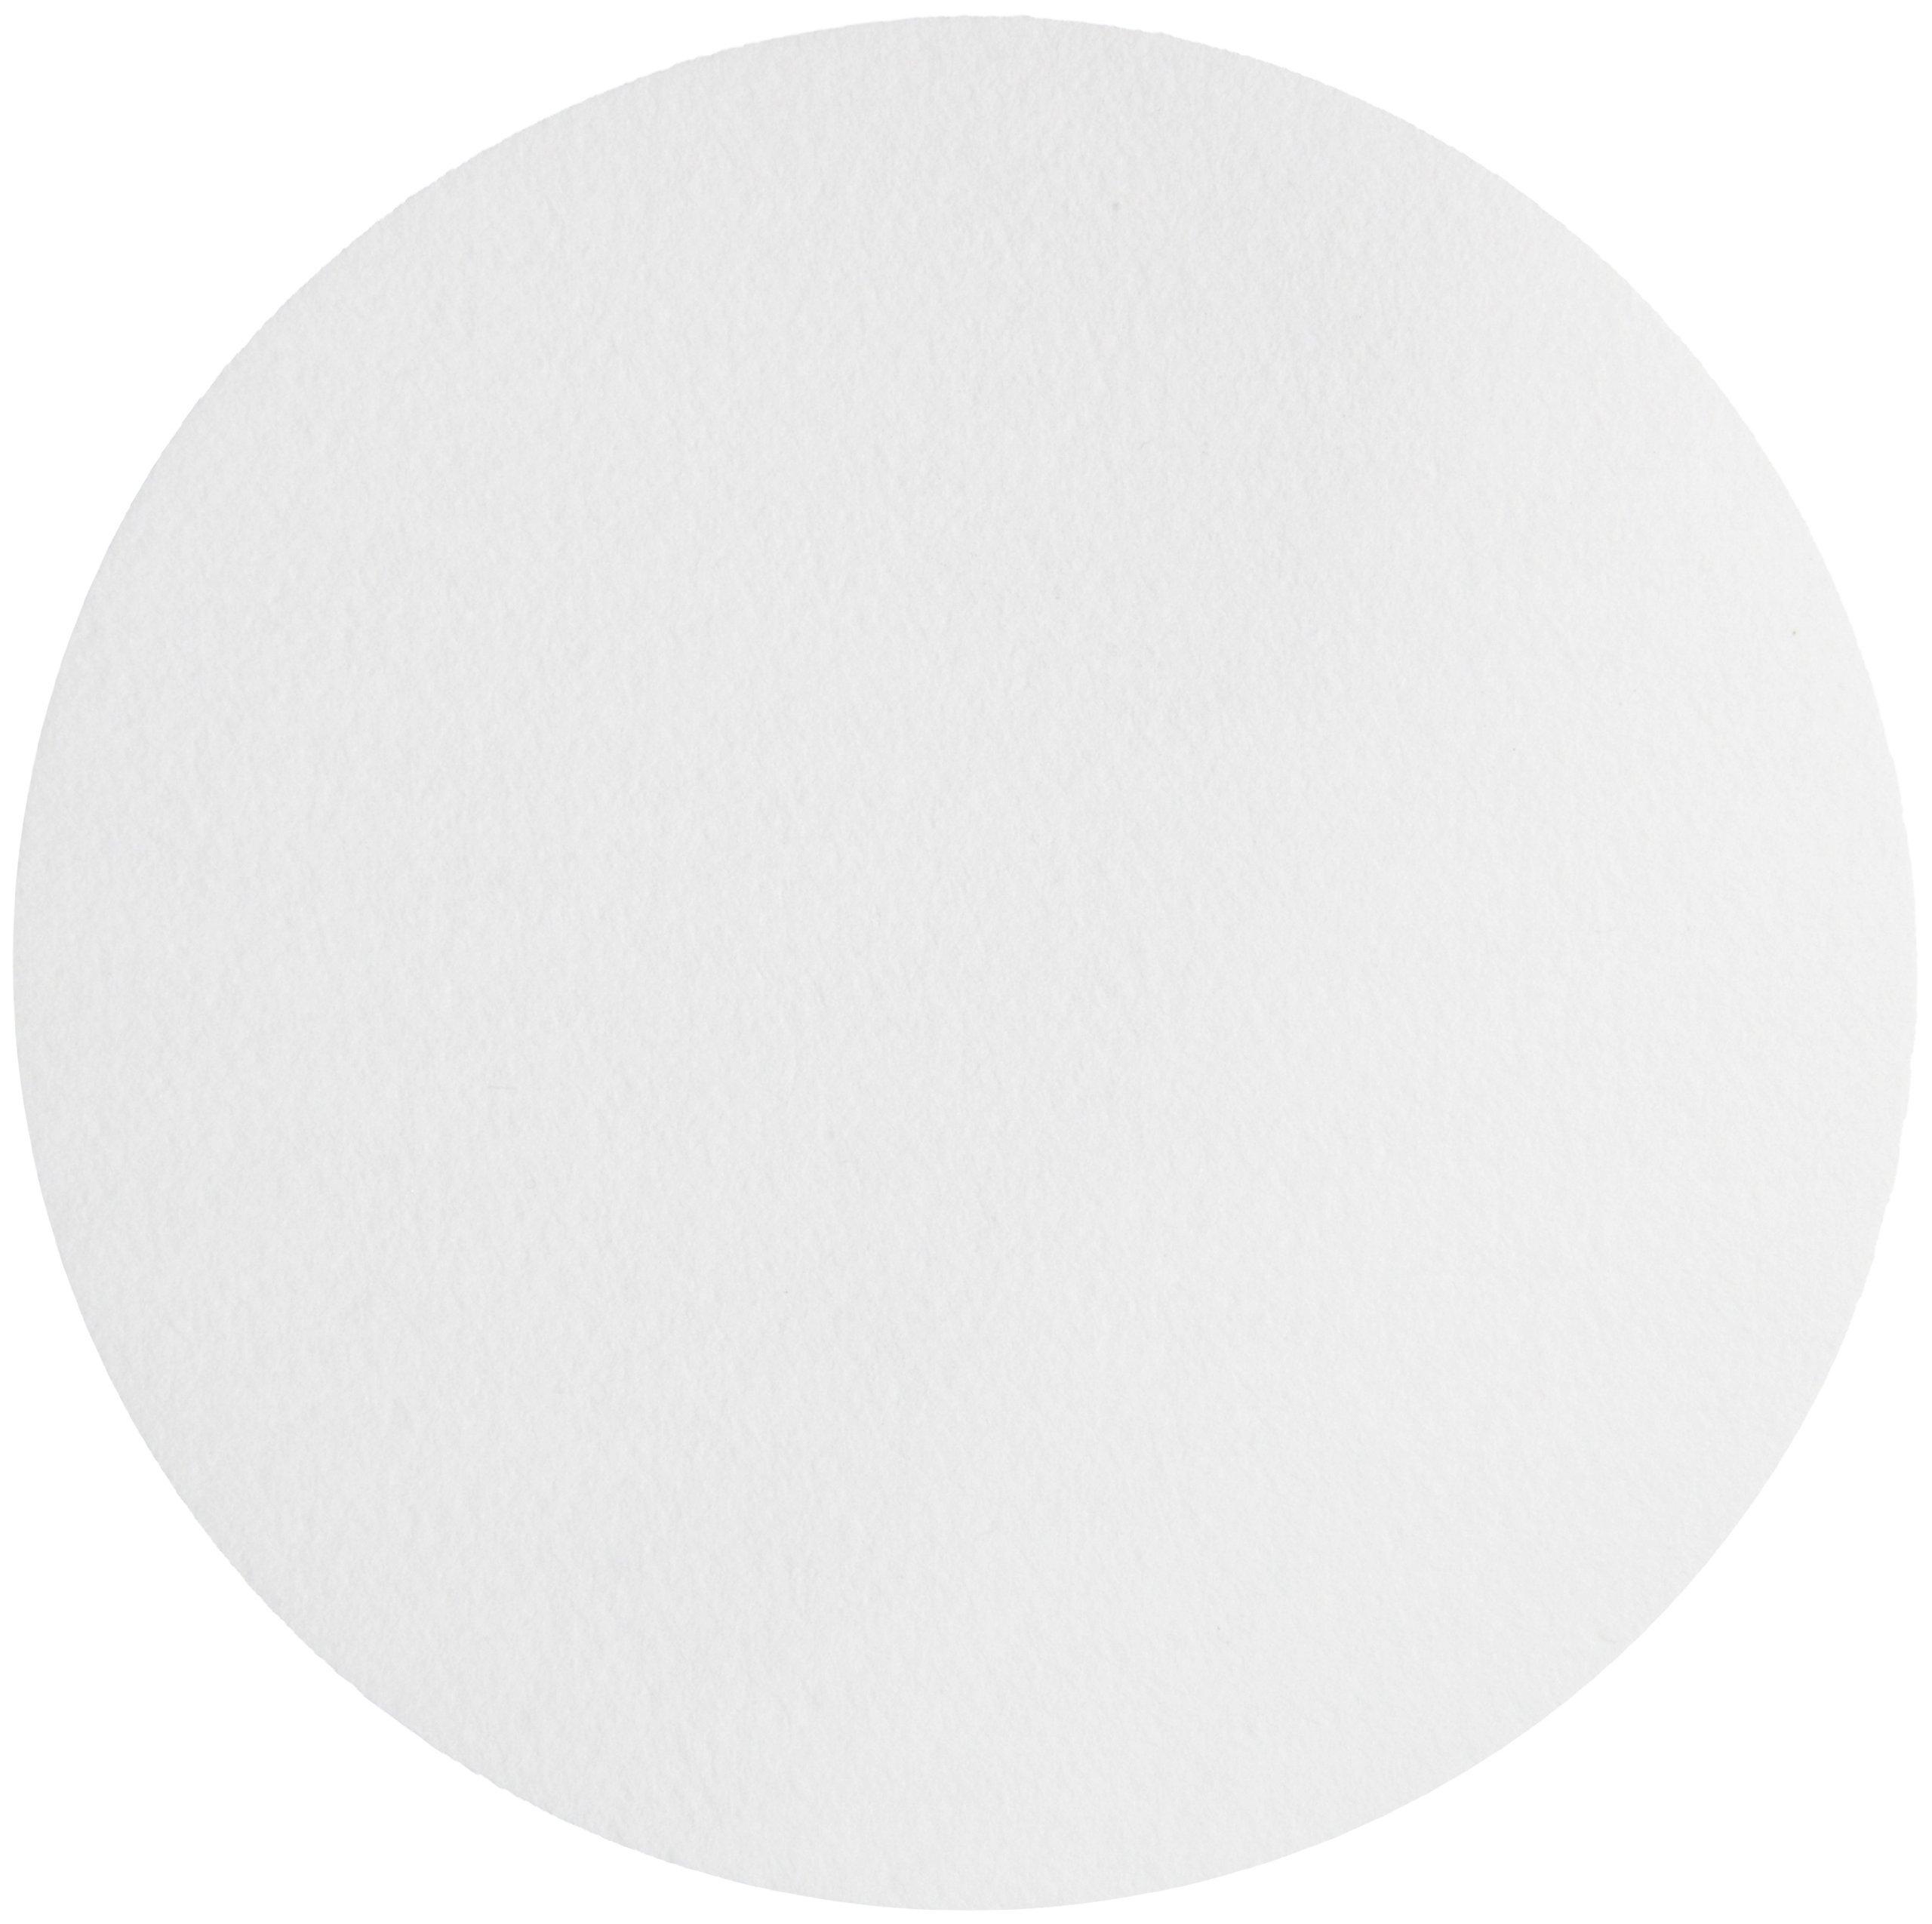 Whatman 1004-240 Quantitative Filter Paper Circles, 20-25 Micron, 3.7 s/100mL/sq inch Flow Rate, Grade 4, 240mm Diameter (Pack of 100)